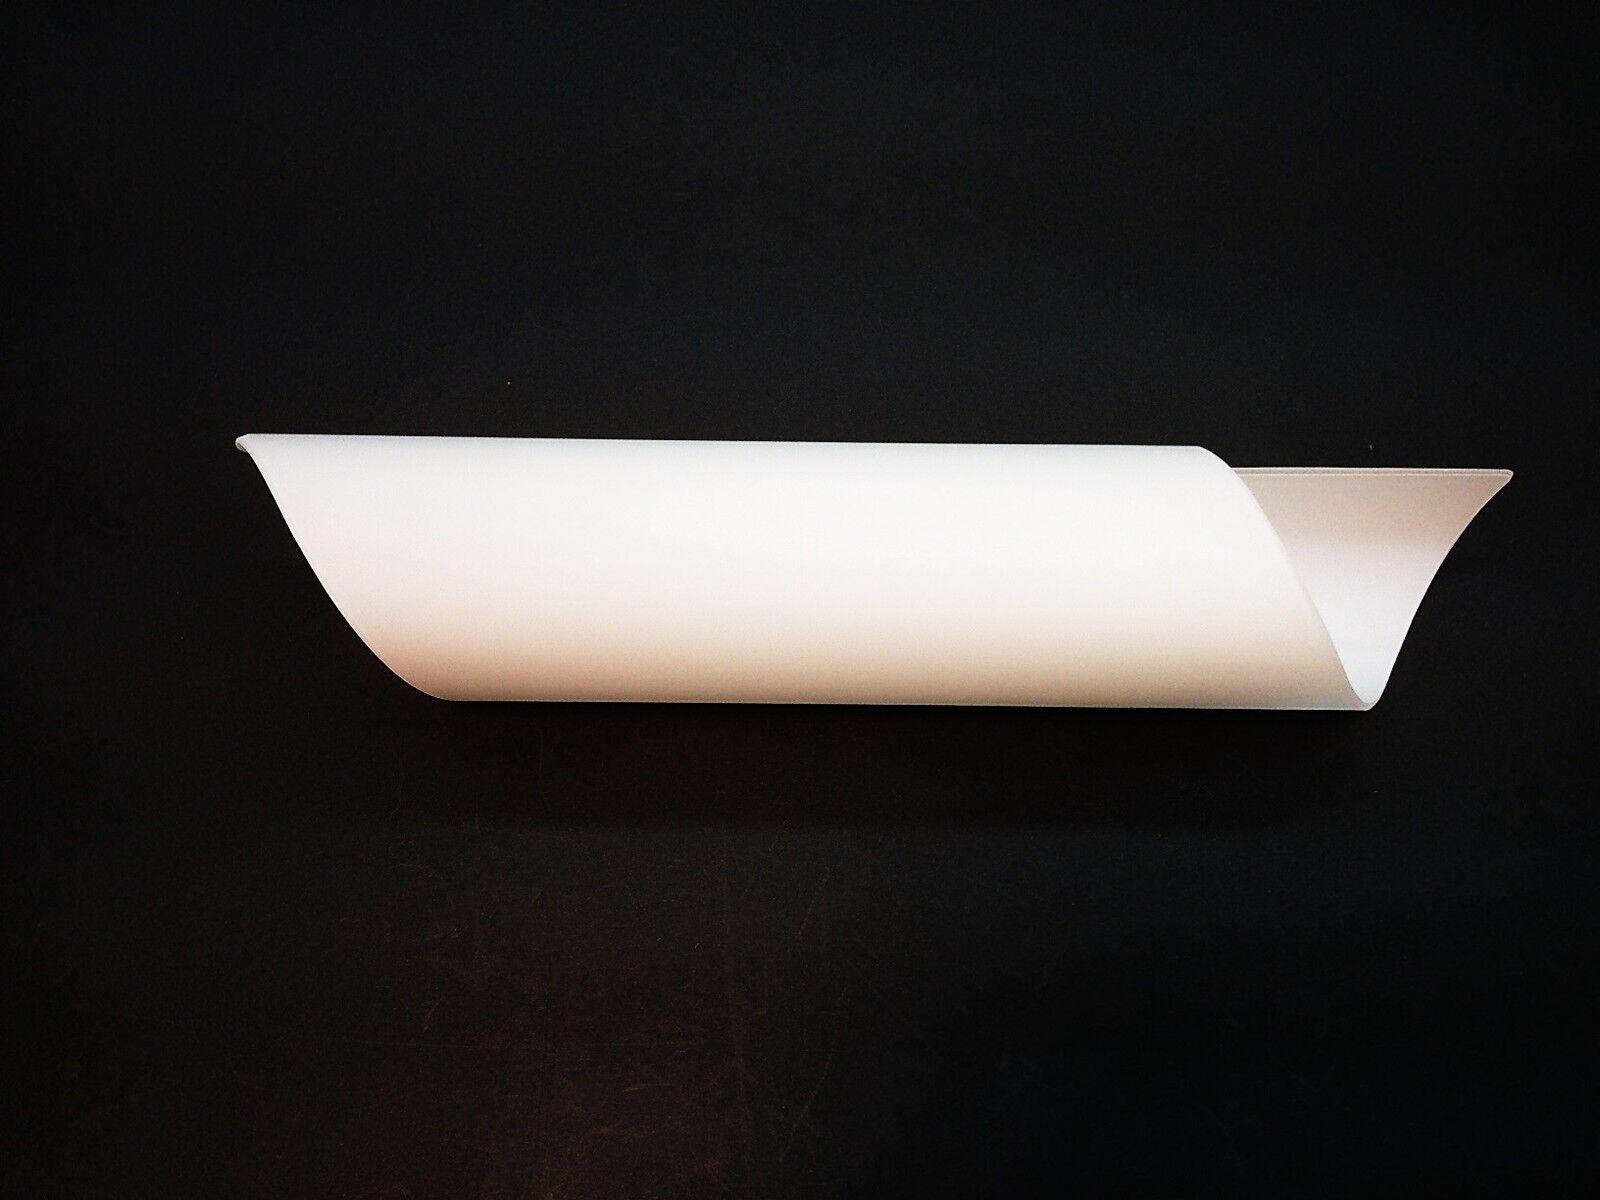 Ersatzglas von Fabas Fabas Fabas Luce für Leuchtenserie Kerry opal weiß Art.CVT 102274210  | Up-to-date Styling  7ea07f